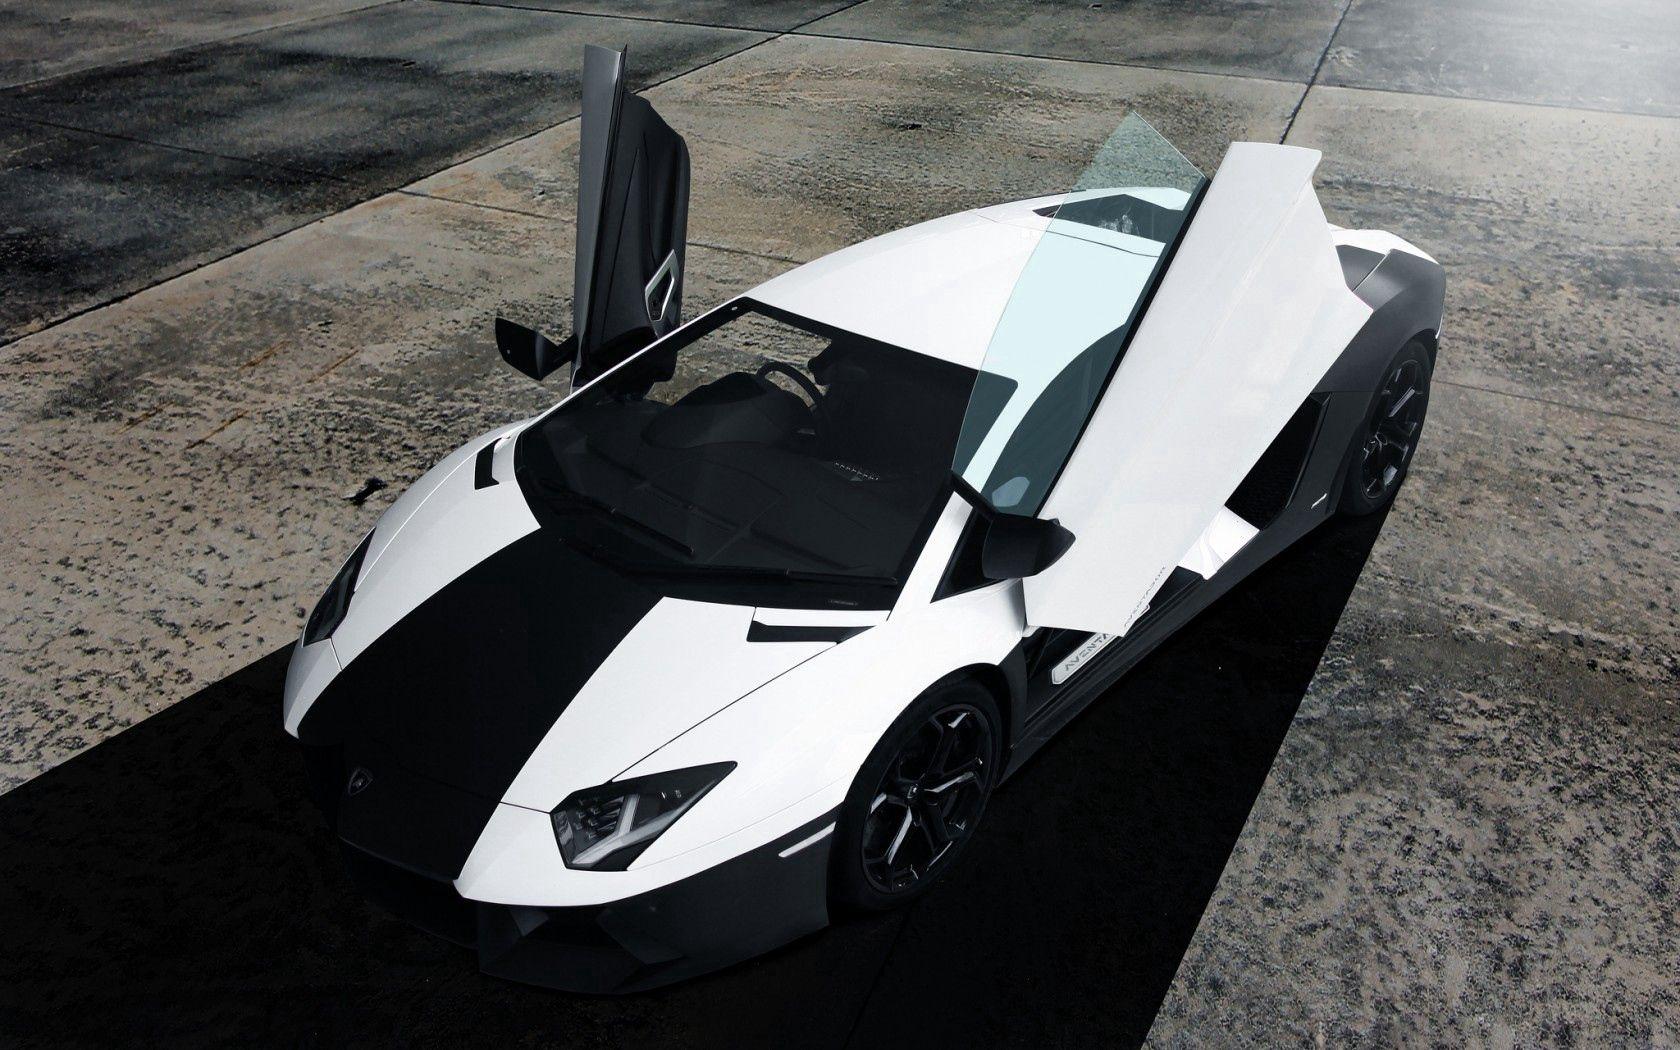 63290 download wallpaper Lamborghini, Cars, Aventador, Before screensavers and pictures for free